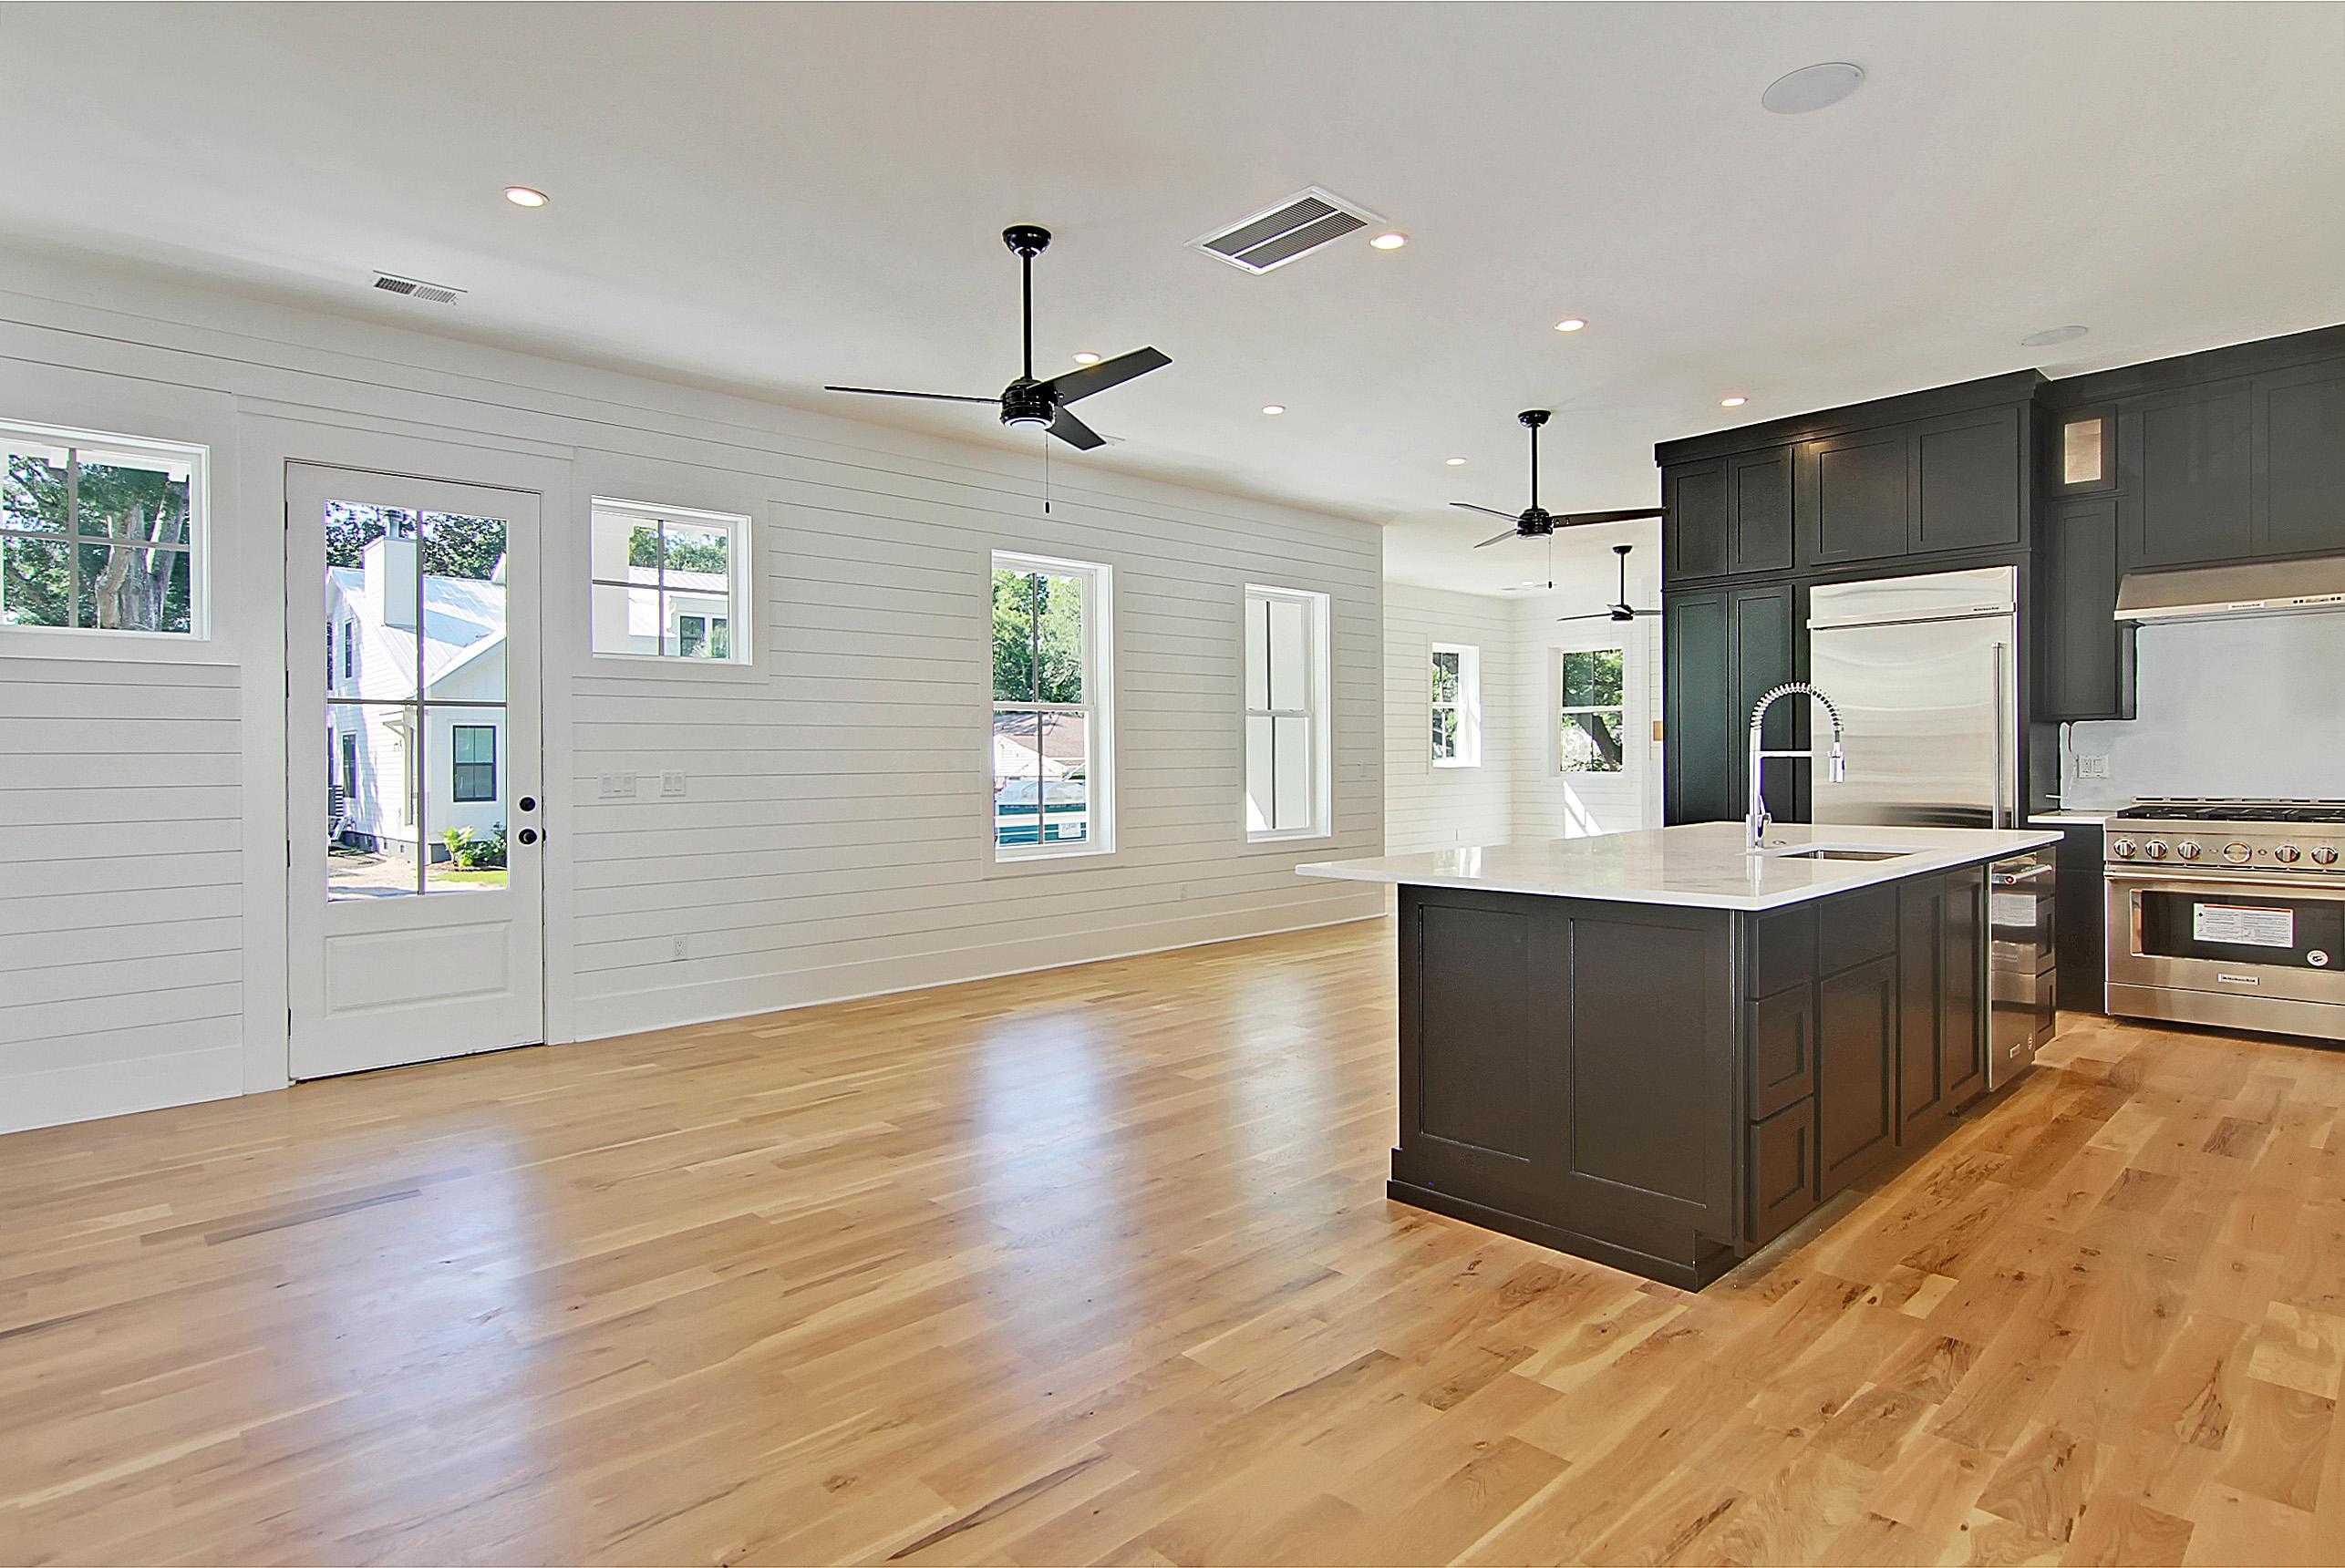 Old Mt Pleasant Homes For Sale - 733 Atlantic, Mount Pleasant, SC - 51